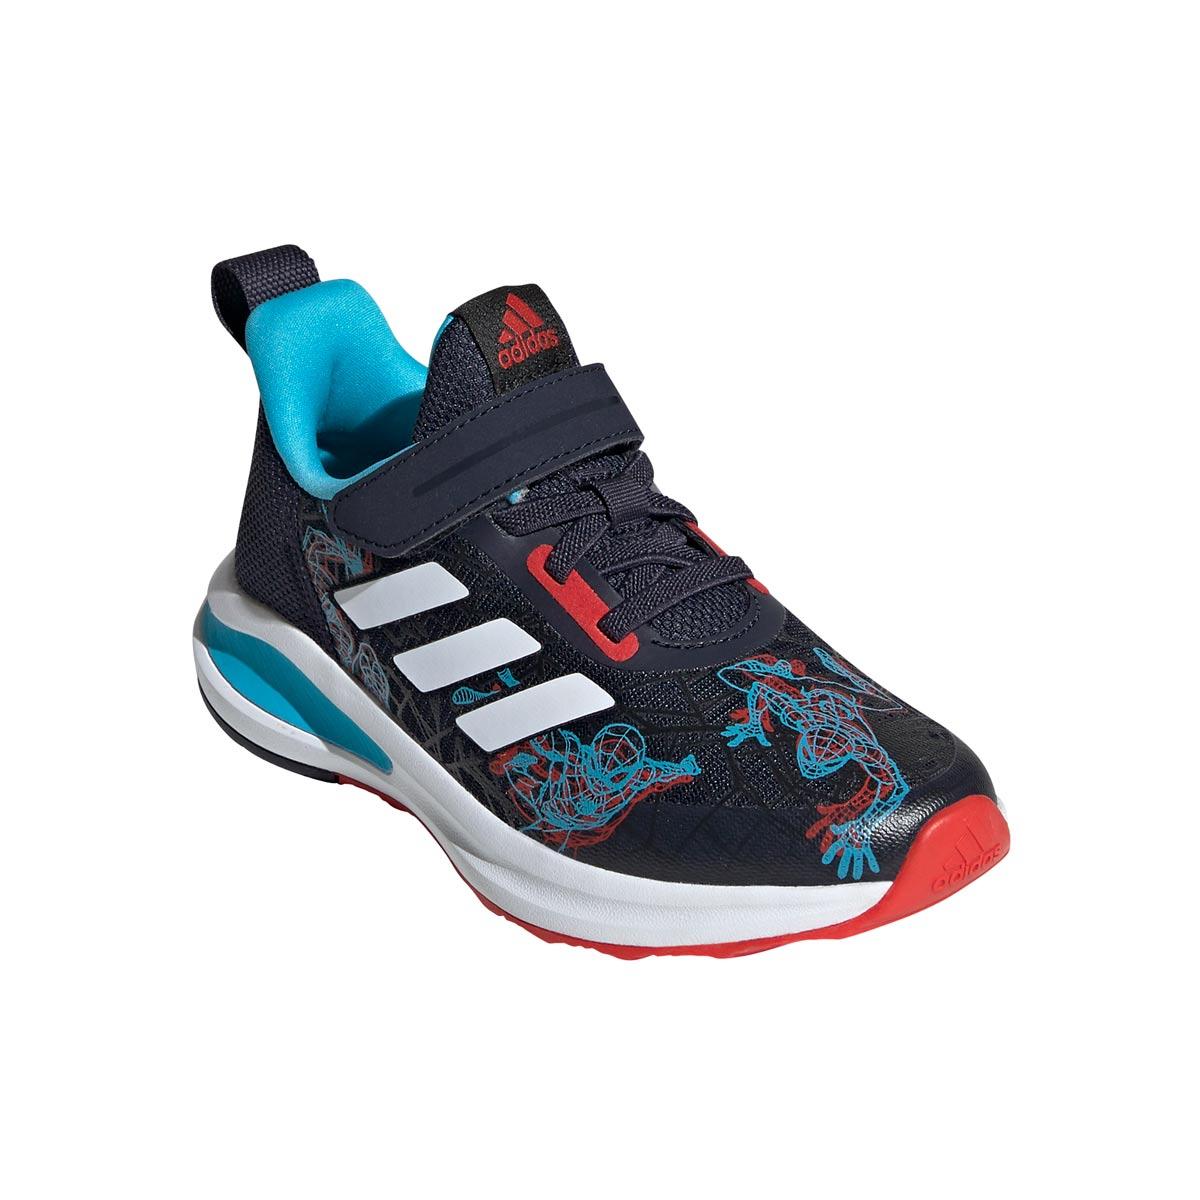 Tenis-Infantil-Adidas-FortaRun-Homem-Aranha--26-ao-32-